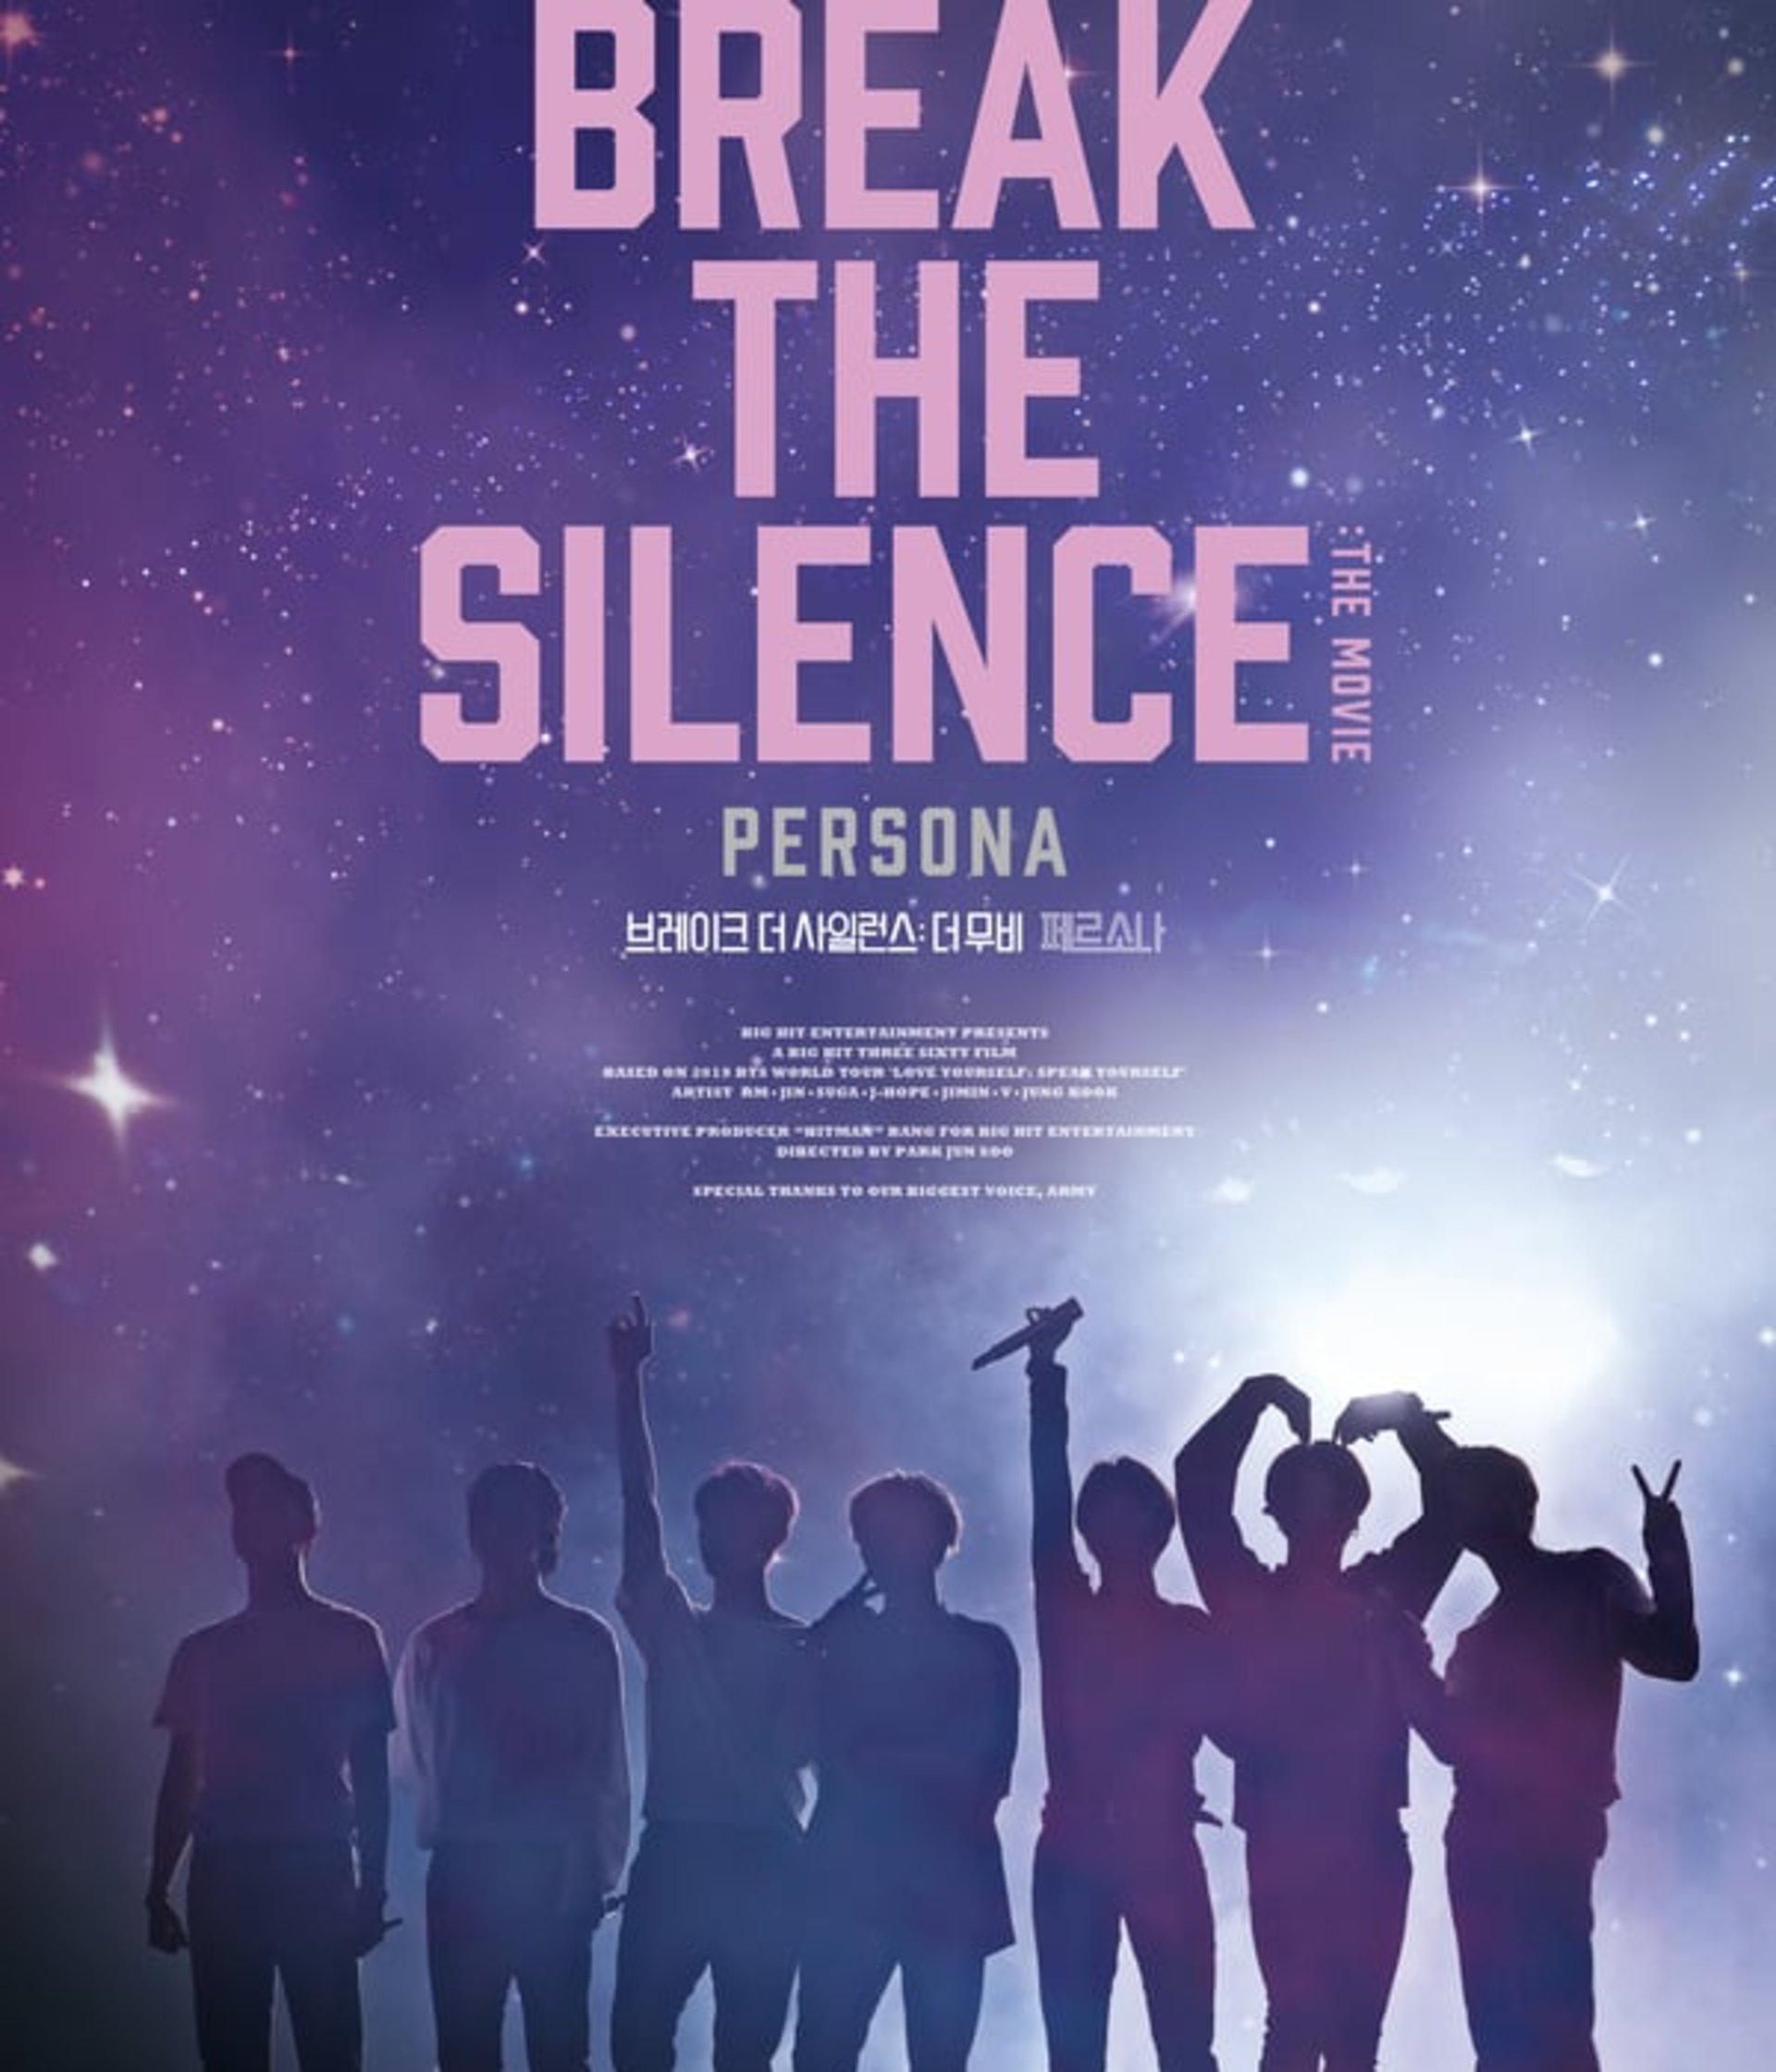 Watch Break The Silence The Movie 2020 Mp4 Free Download Ramesigana Com